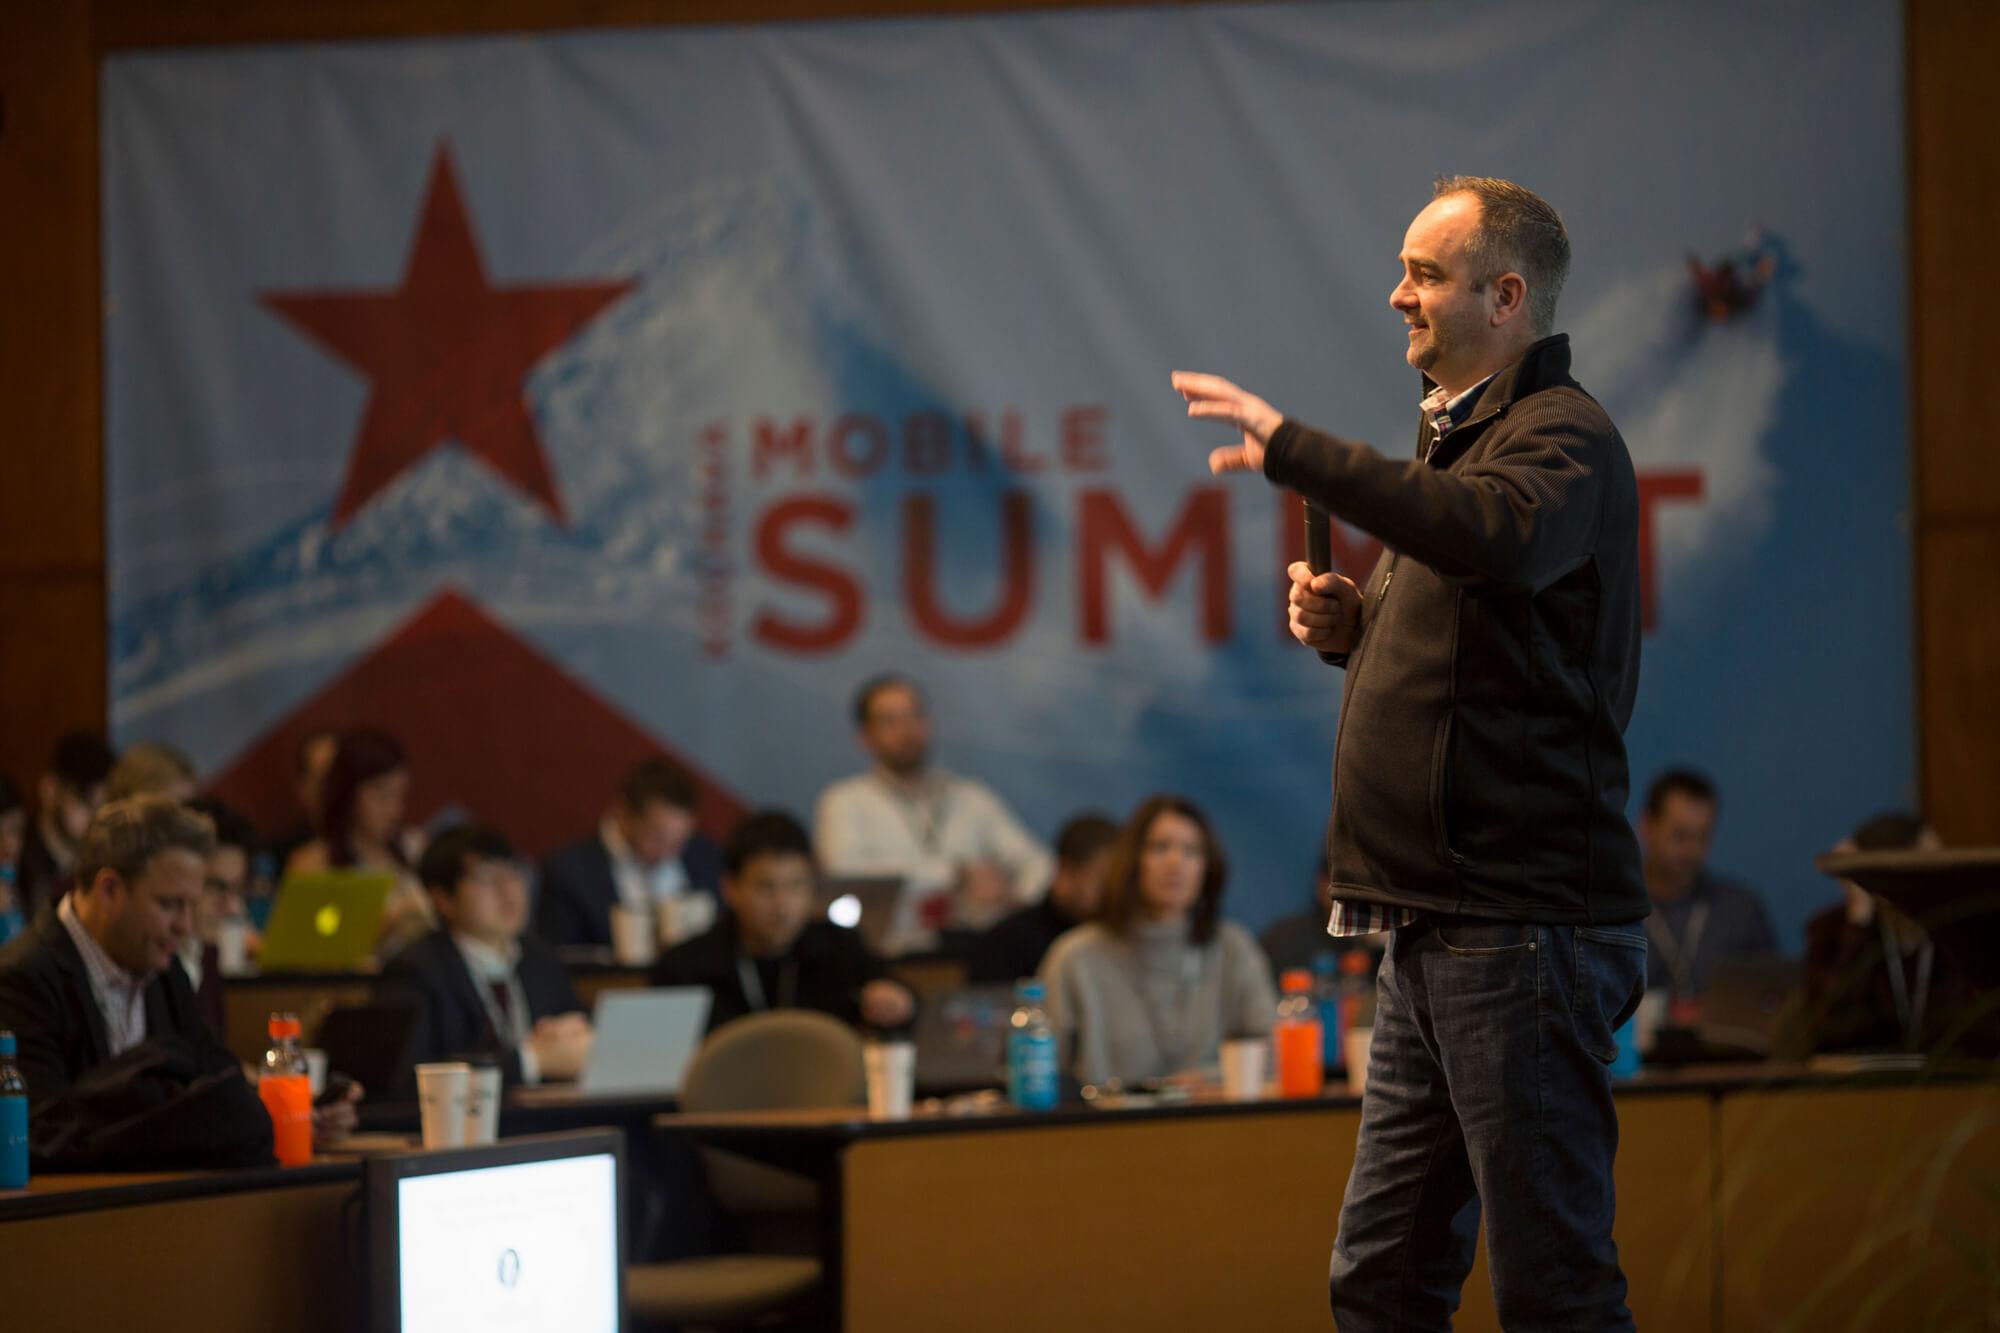 Charles Mannings speaking on stage at the Kochava Summit